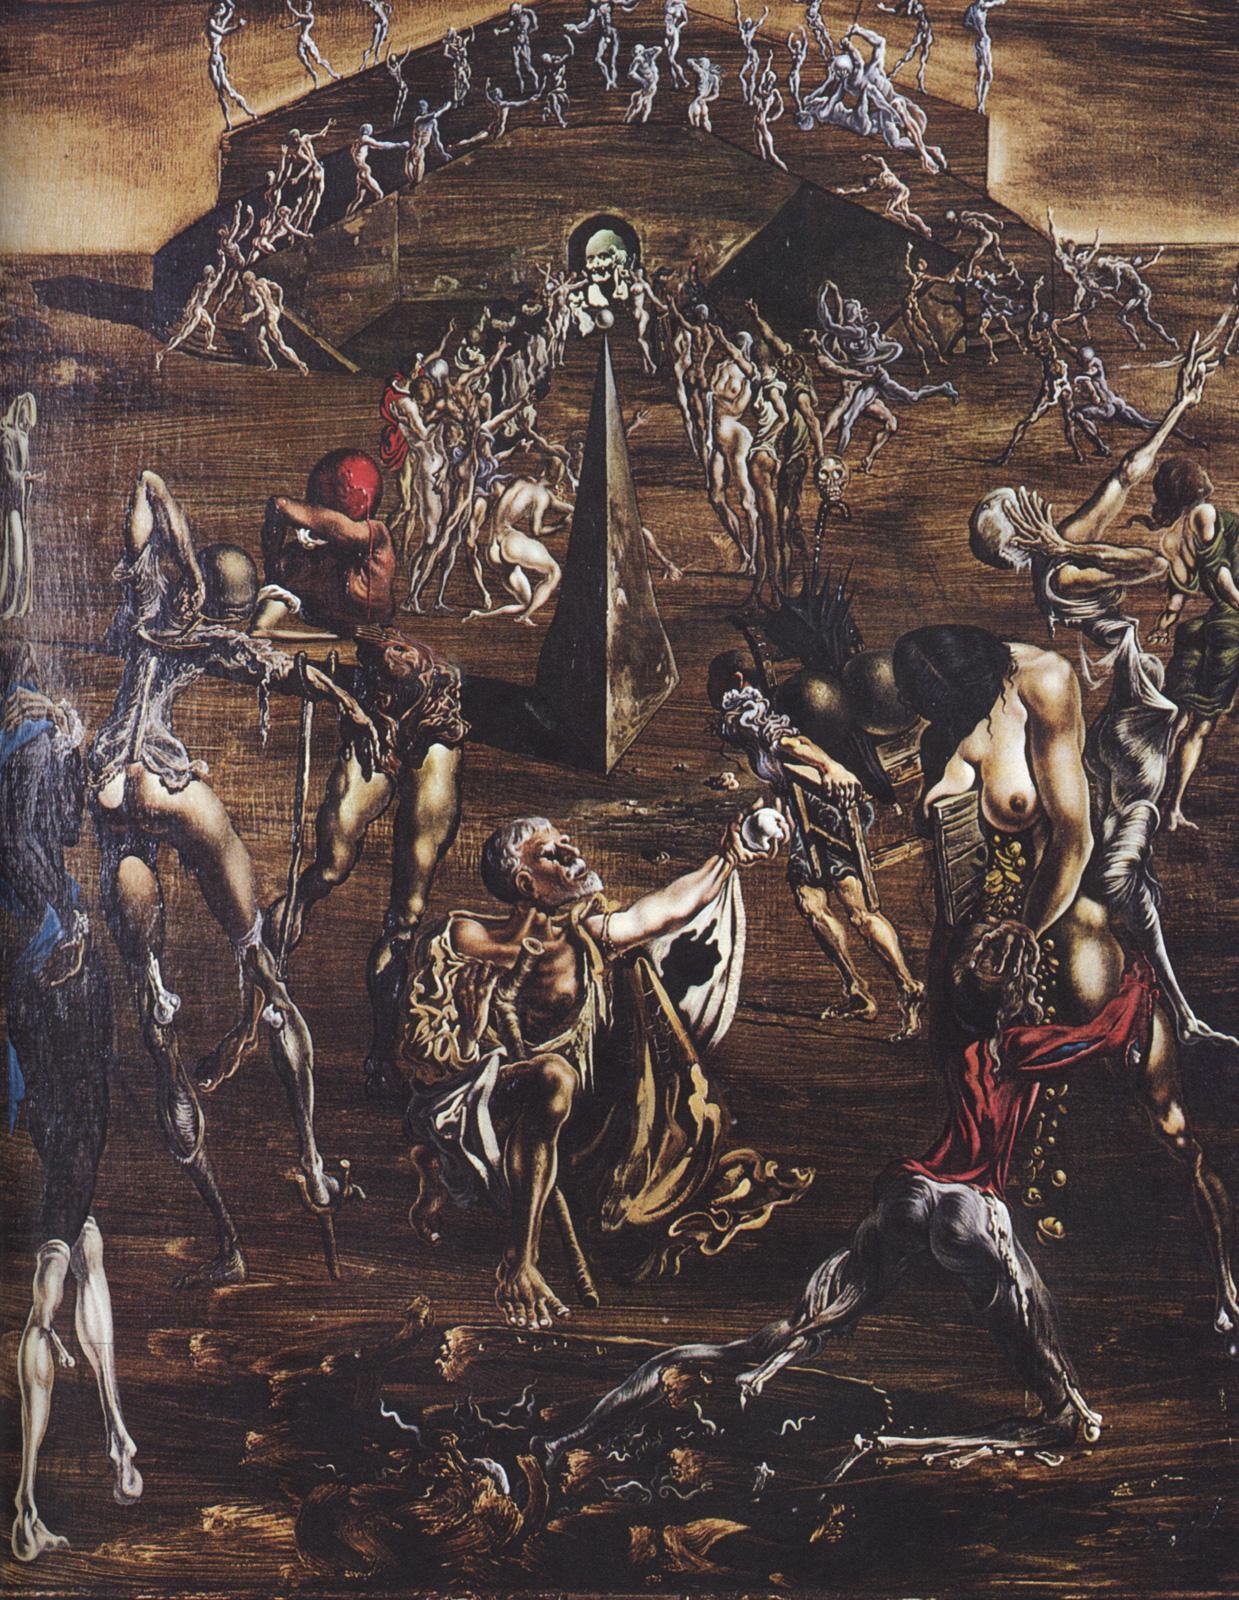 https://uploads0.wikiart.org/images/salvador-dali/resurrection-of-the-flesh.jpg